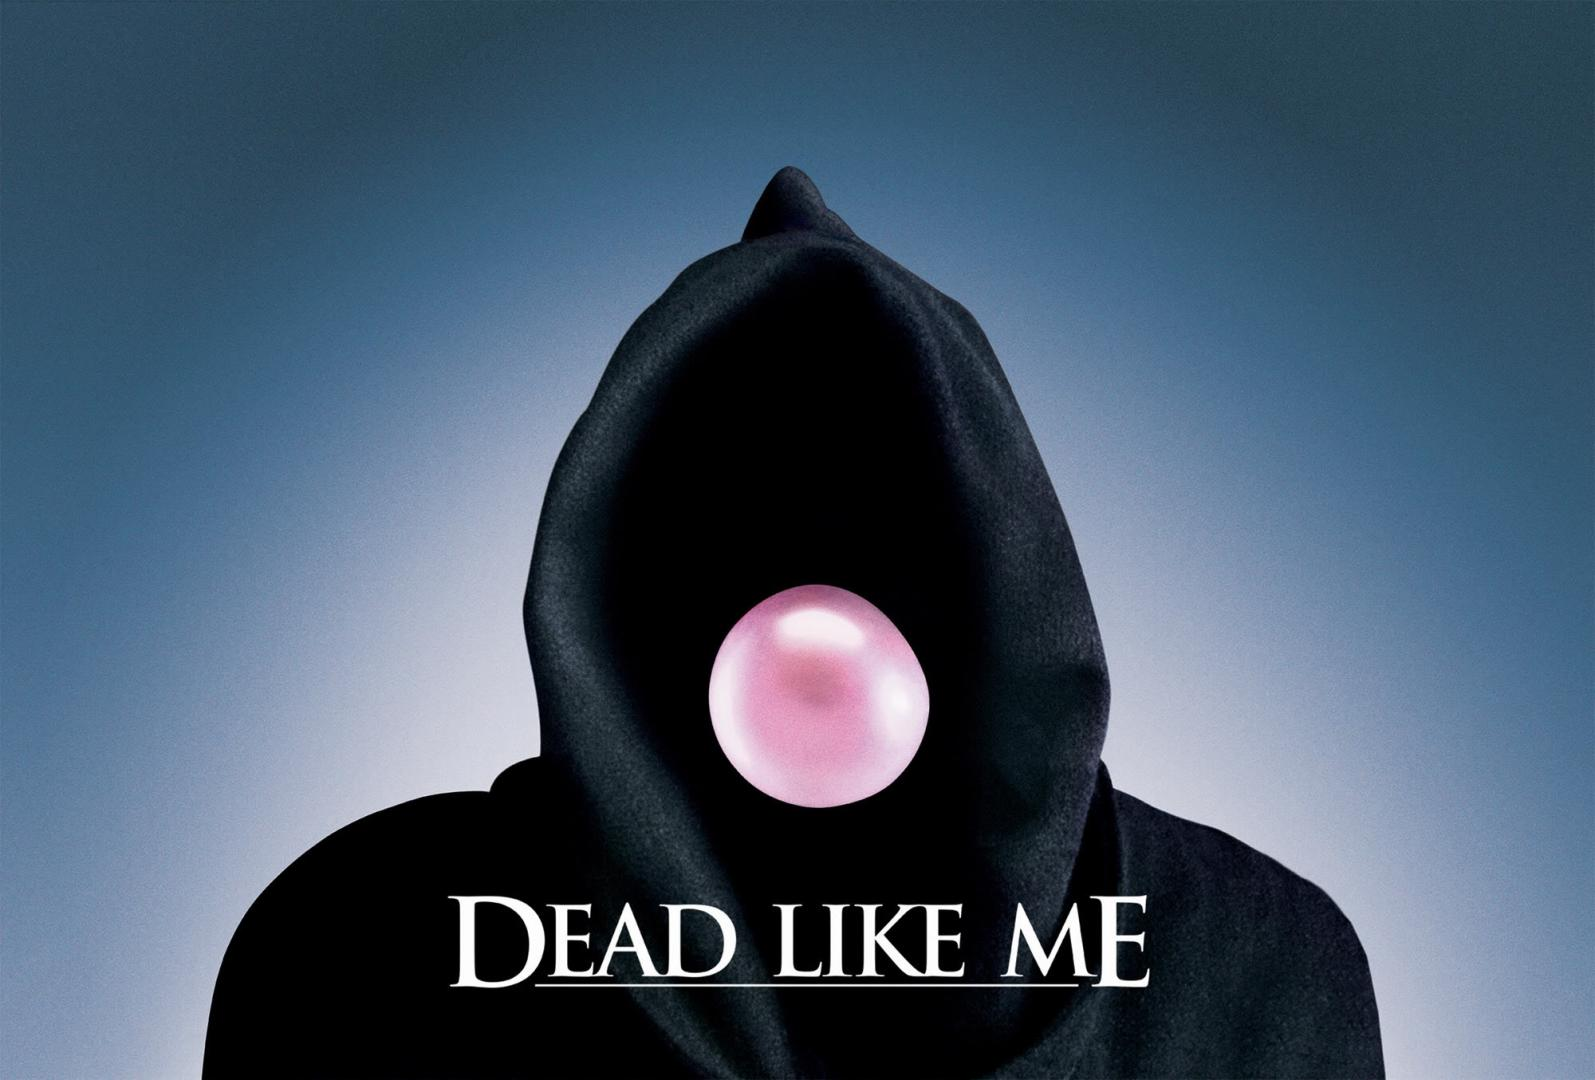 Dead Like Me - Haláli hullák (2003-2004)